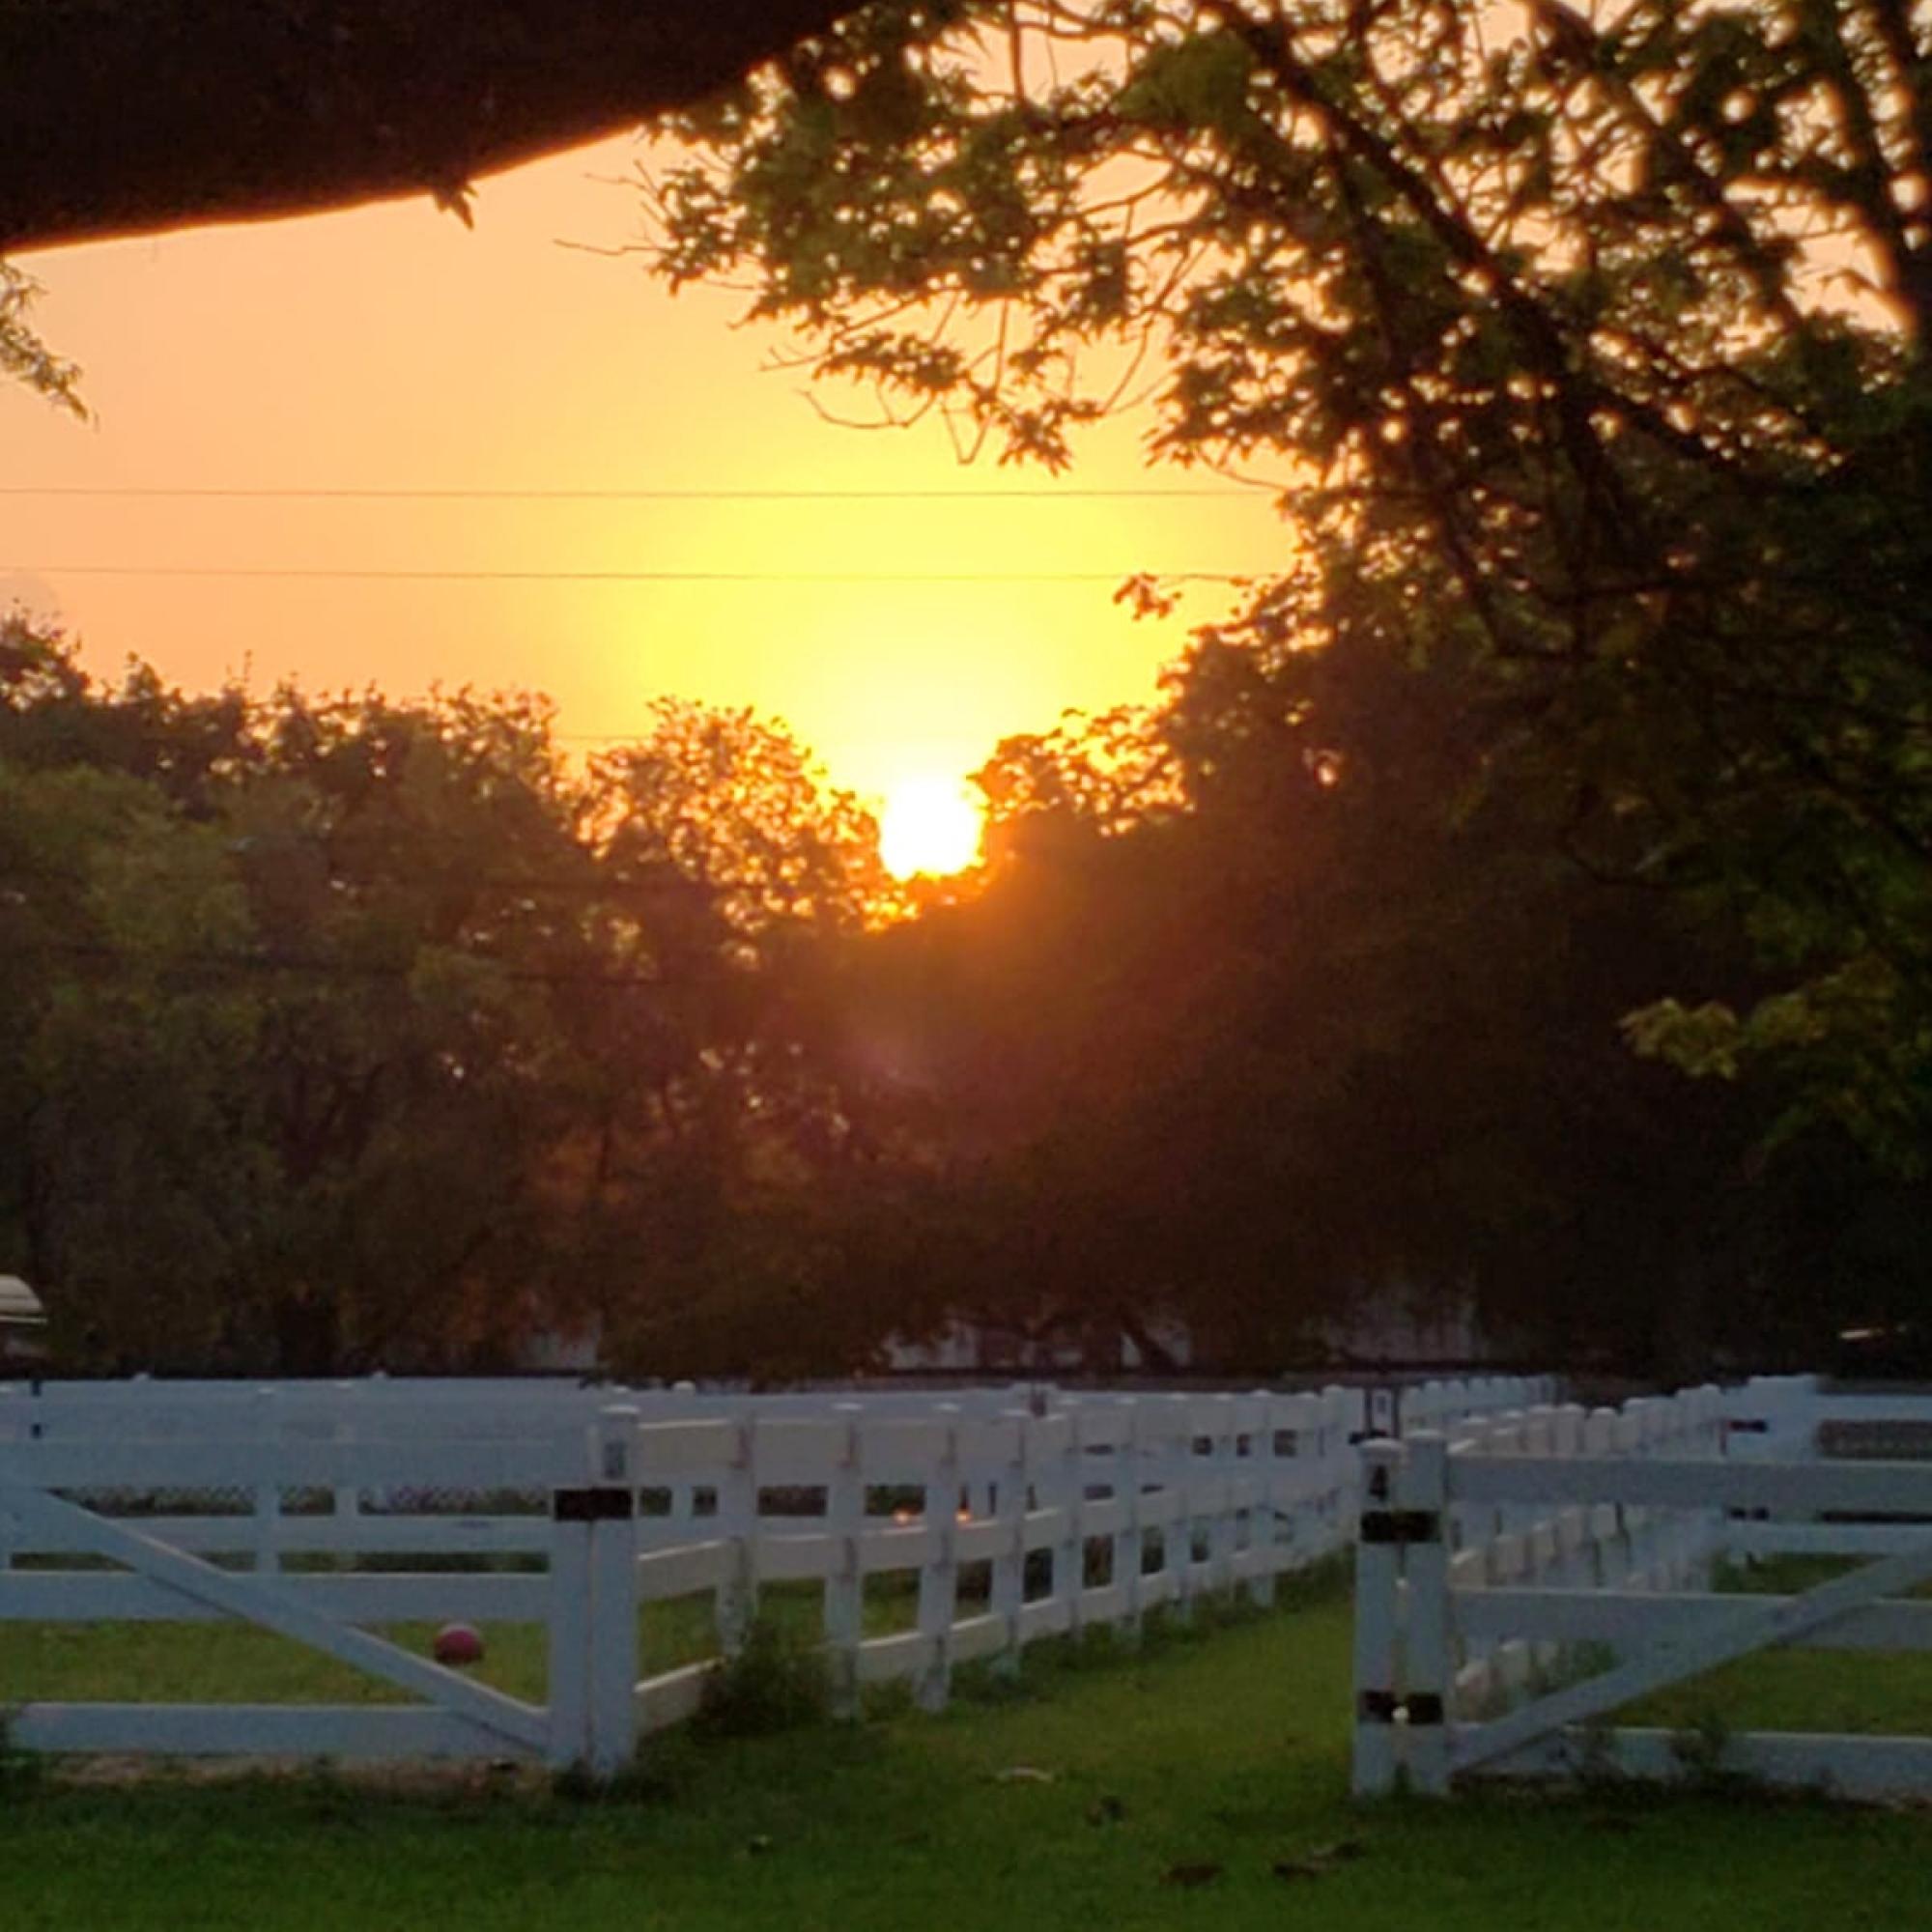 SFSPCA Ranch at sunset